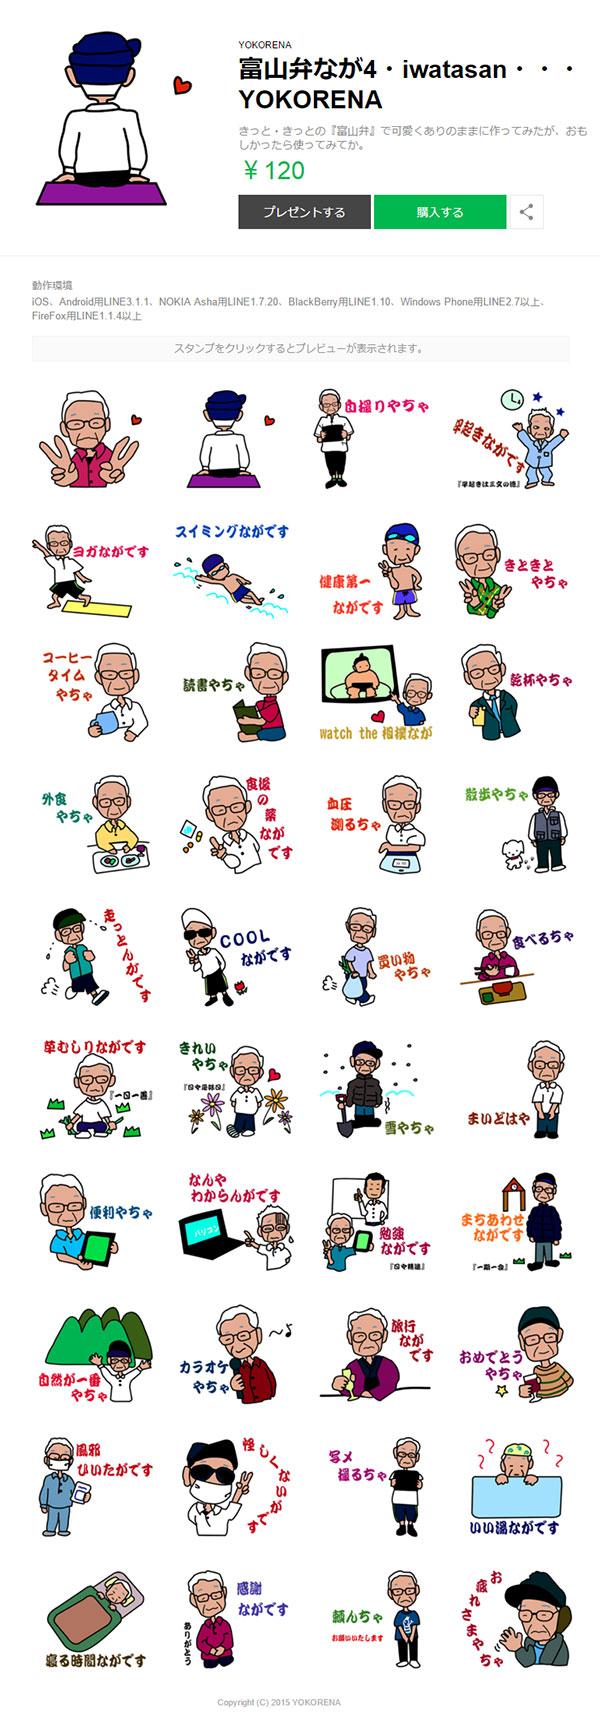 Japanese dialects toyama4 .yokorena